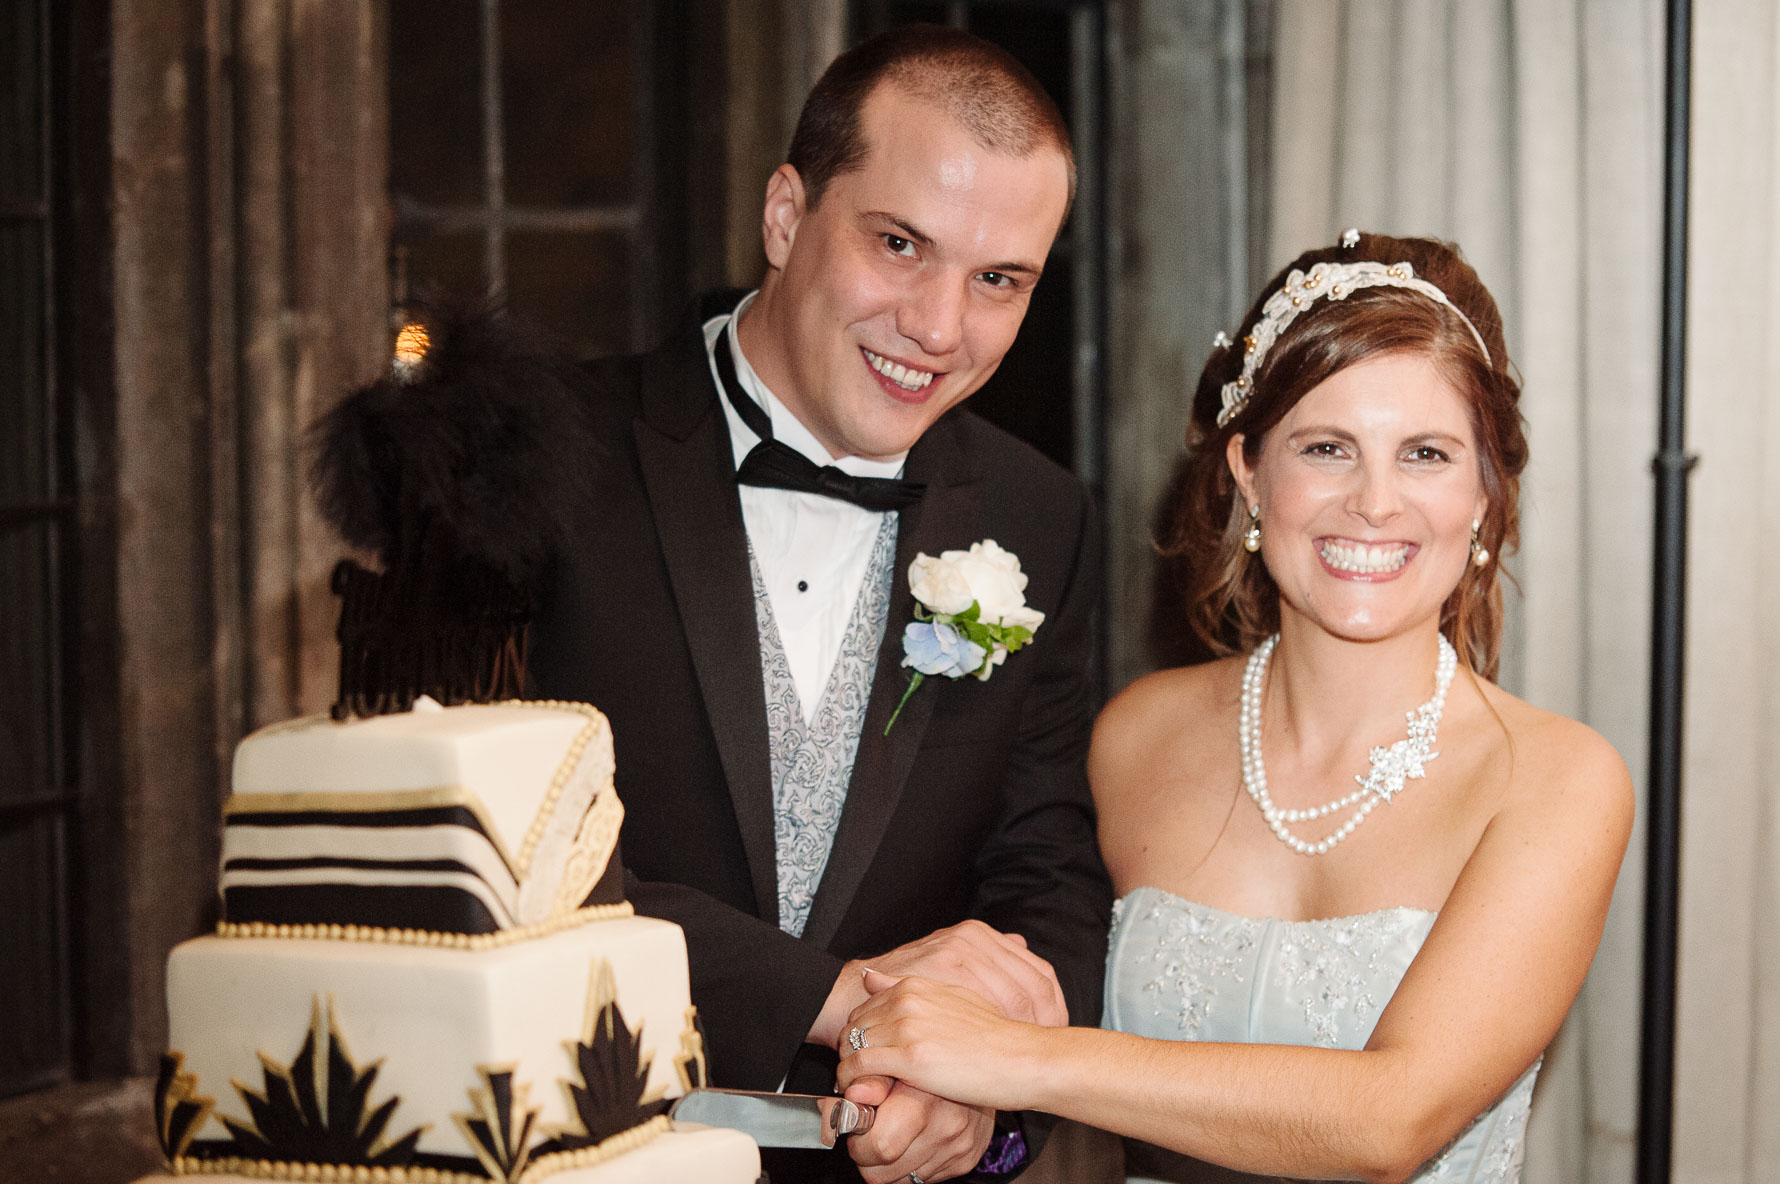 Leeds Castle Wedding50-20140919 1501